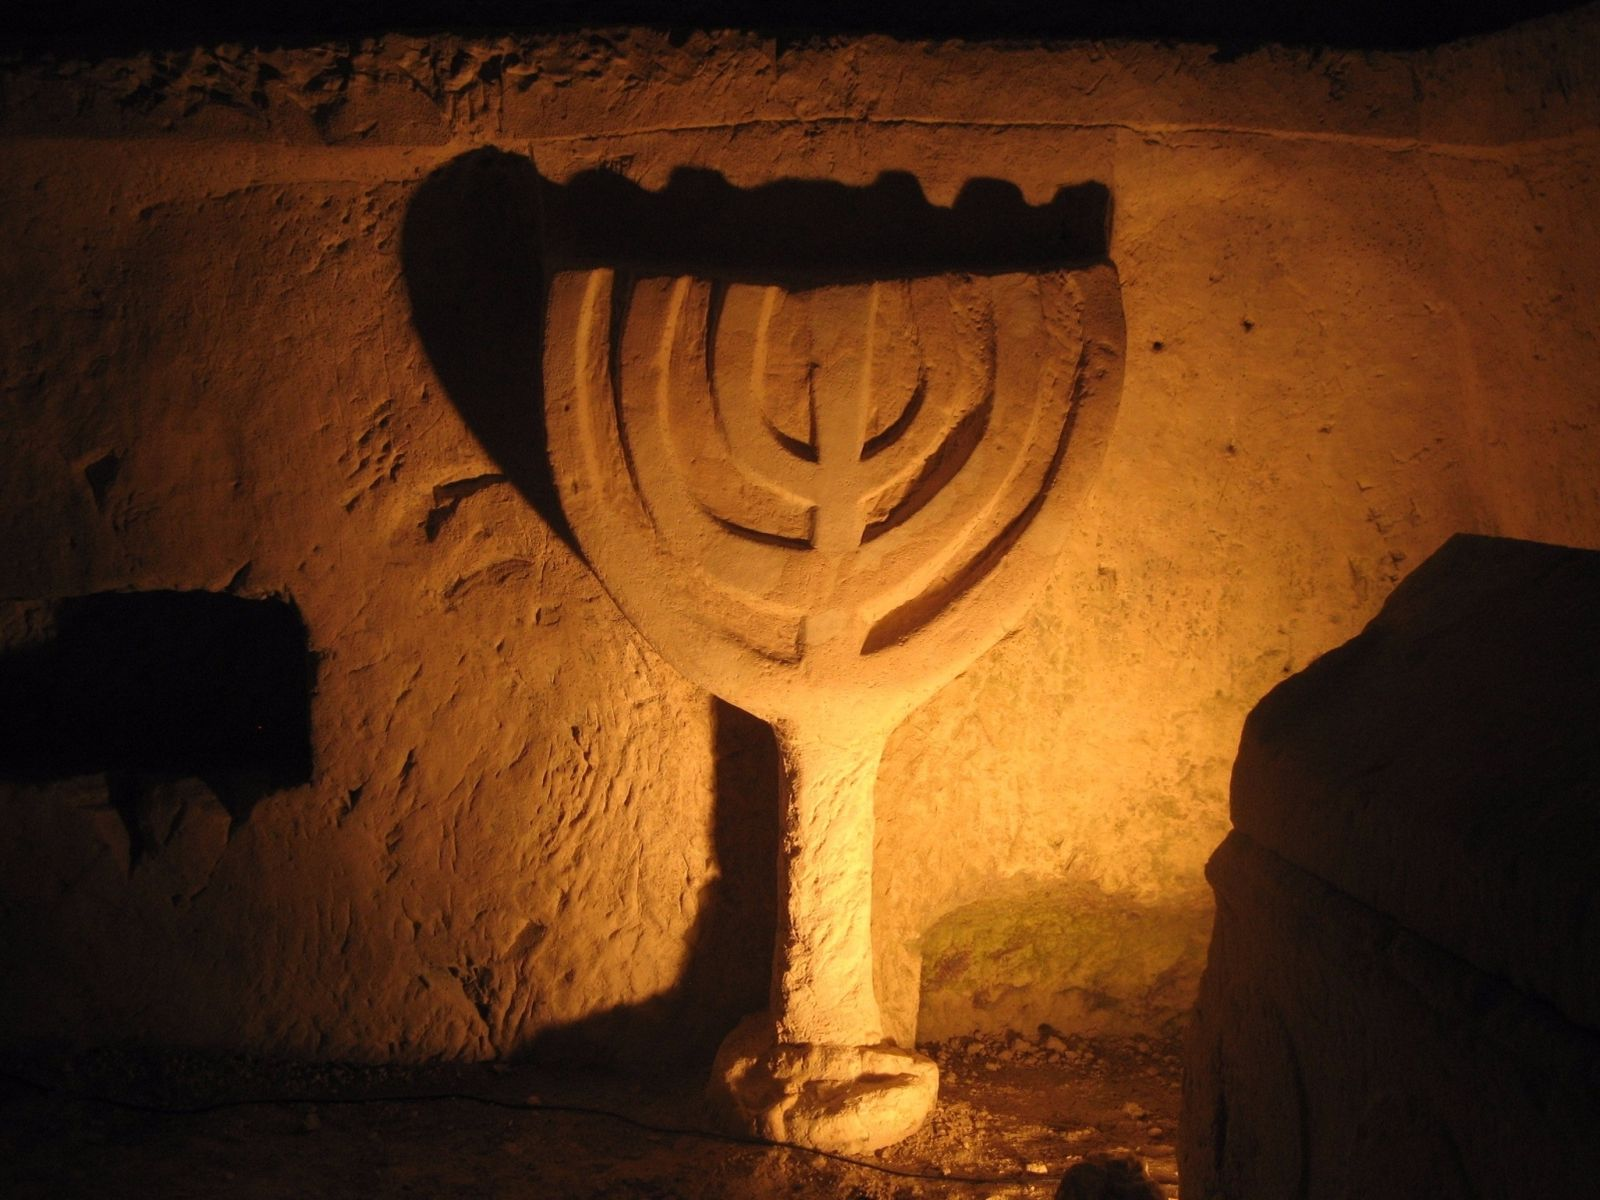 Inside Catacomb 1. Photo by Tsvika Tsuk/Israel Nature and Parks Authority